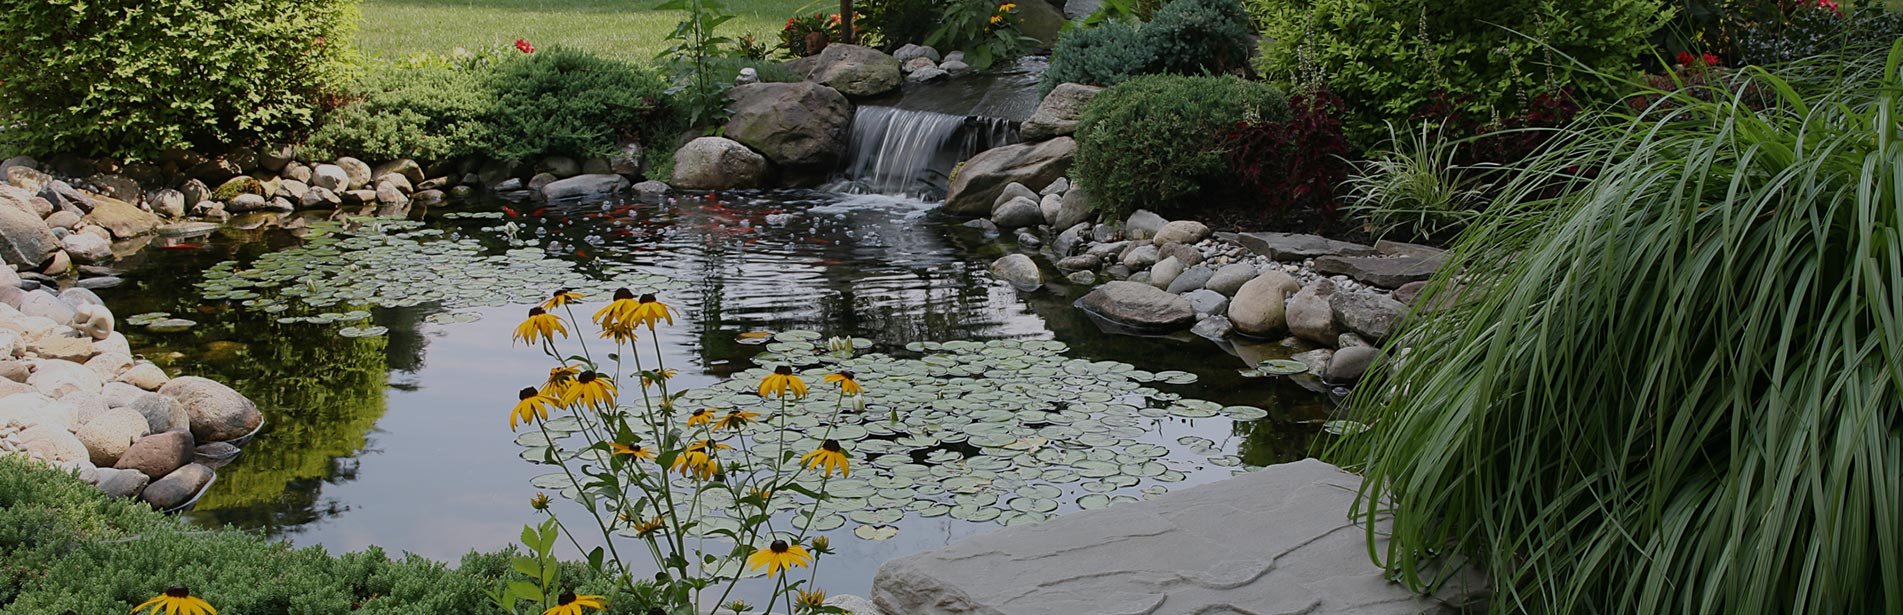 water features backyard